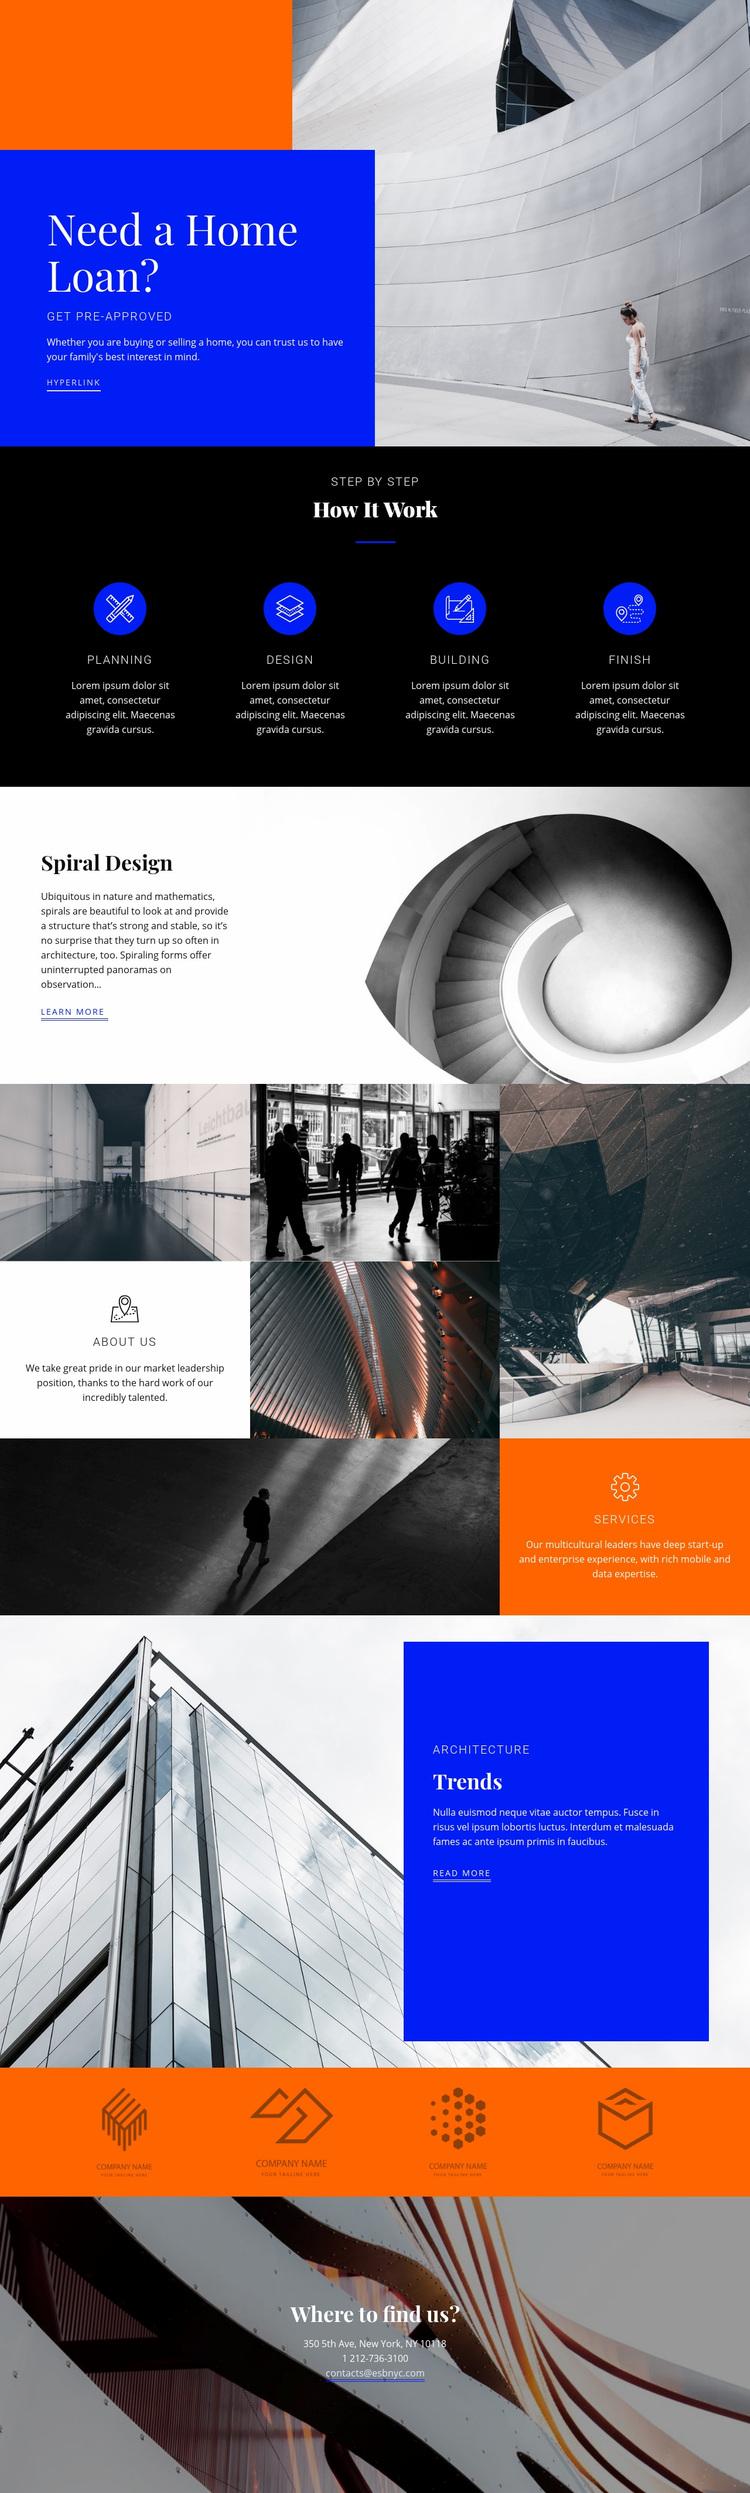 Local real estate agency Web Page Designer